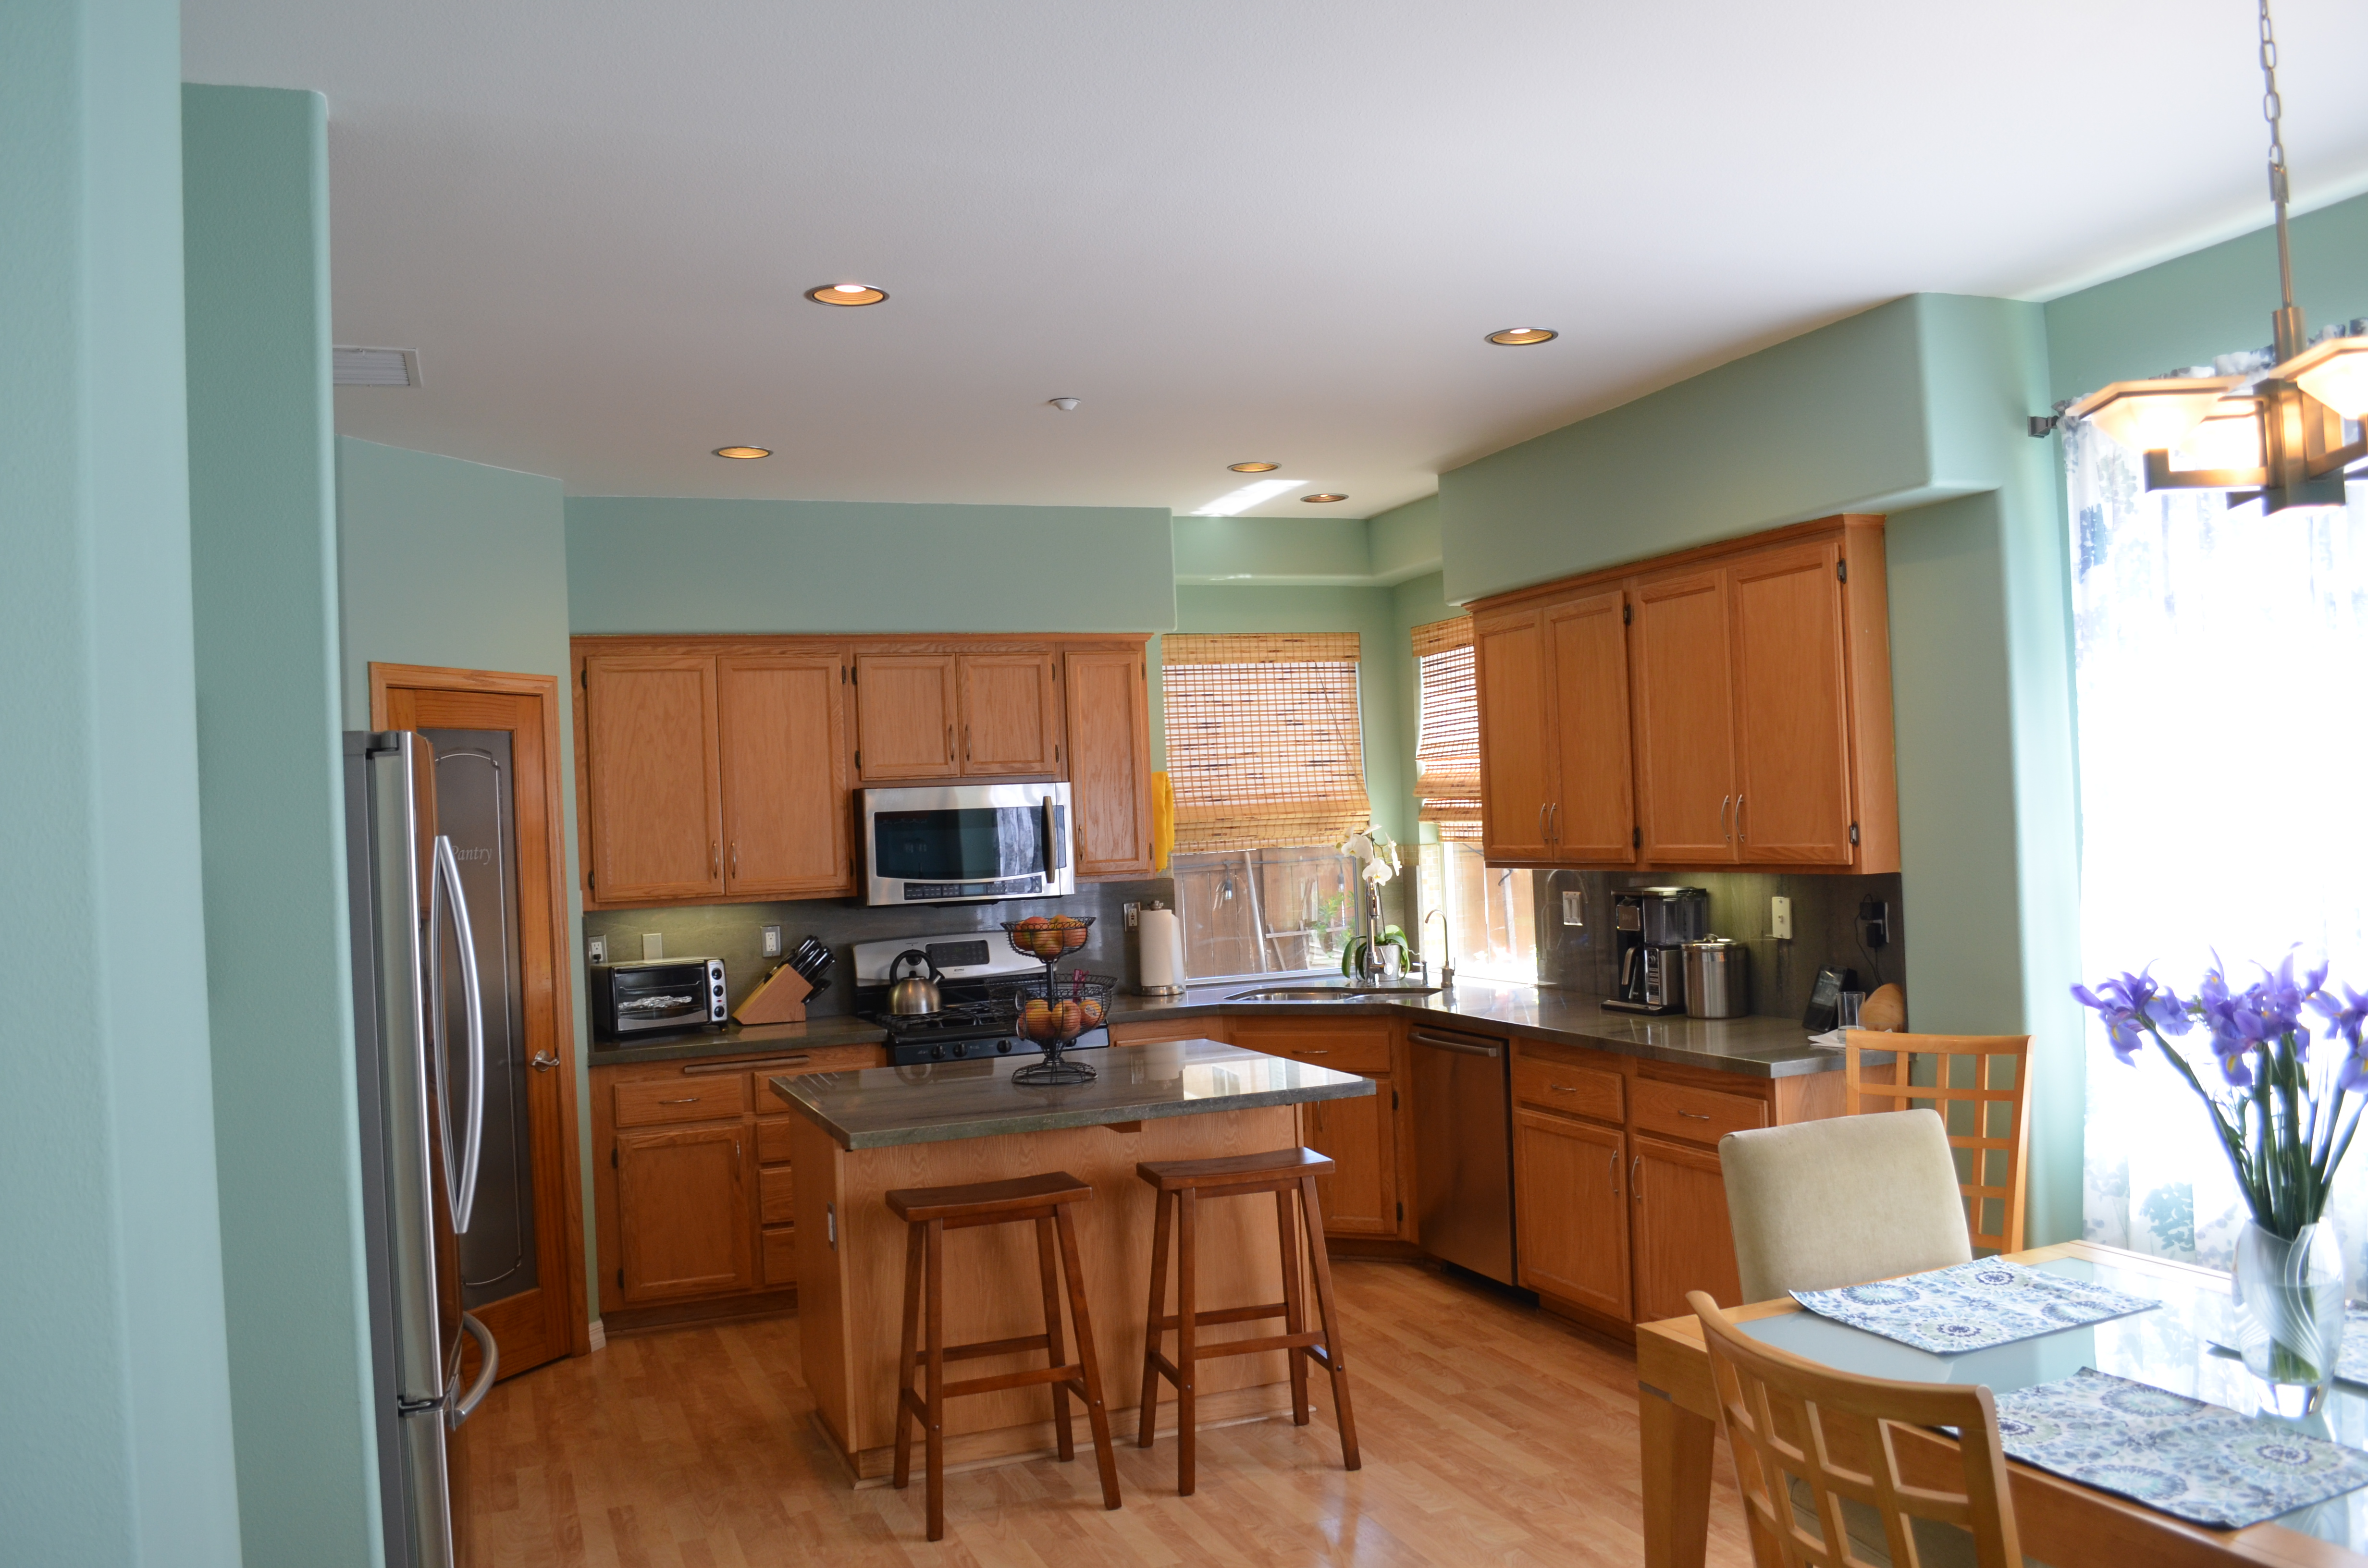 North Oxnard Home view of kitchen